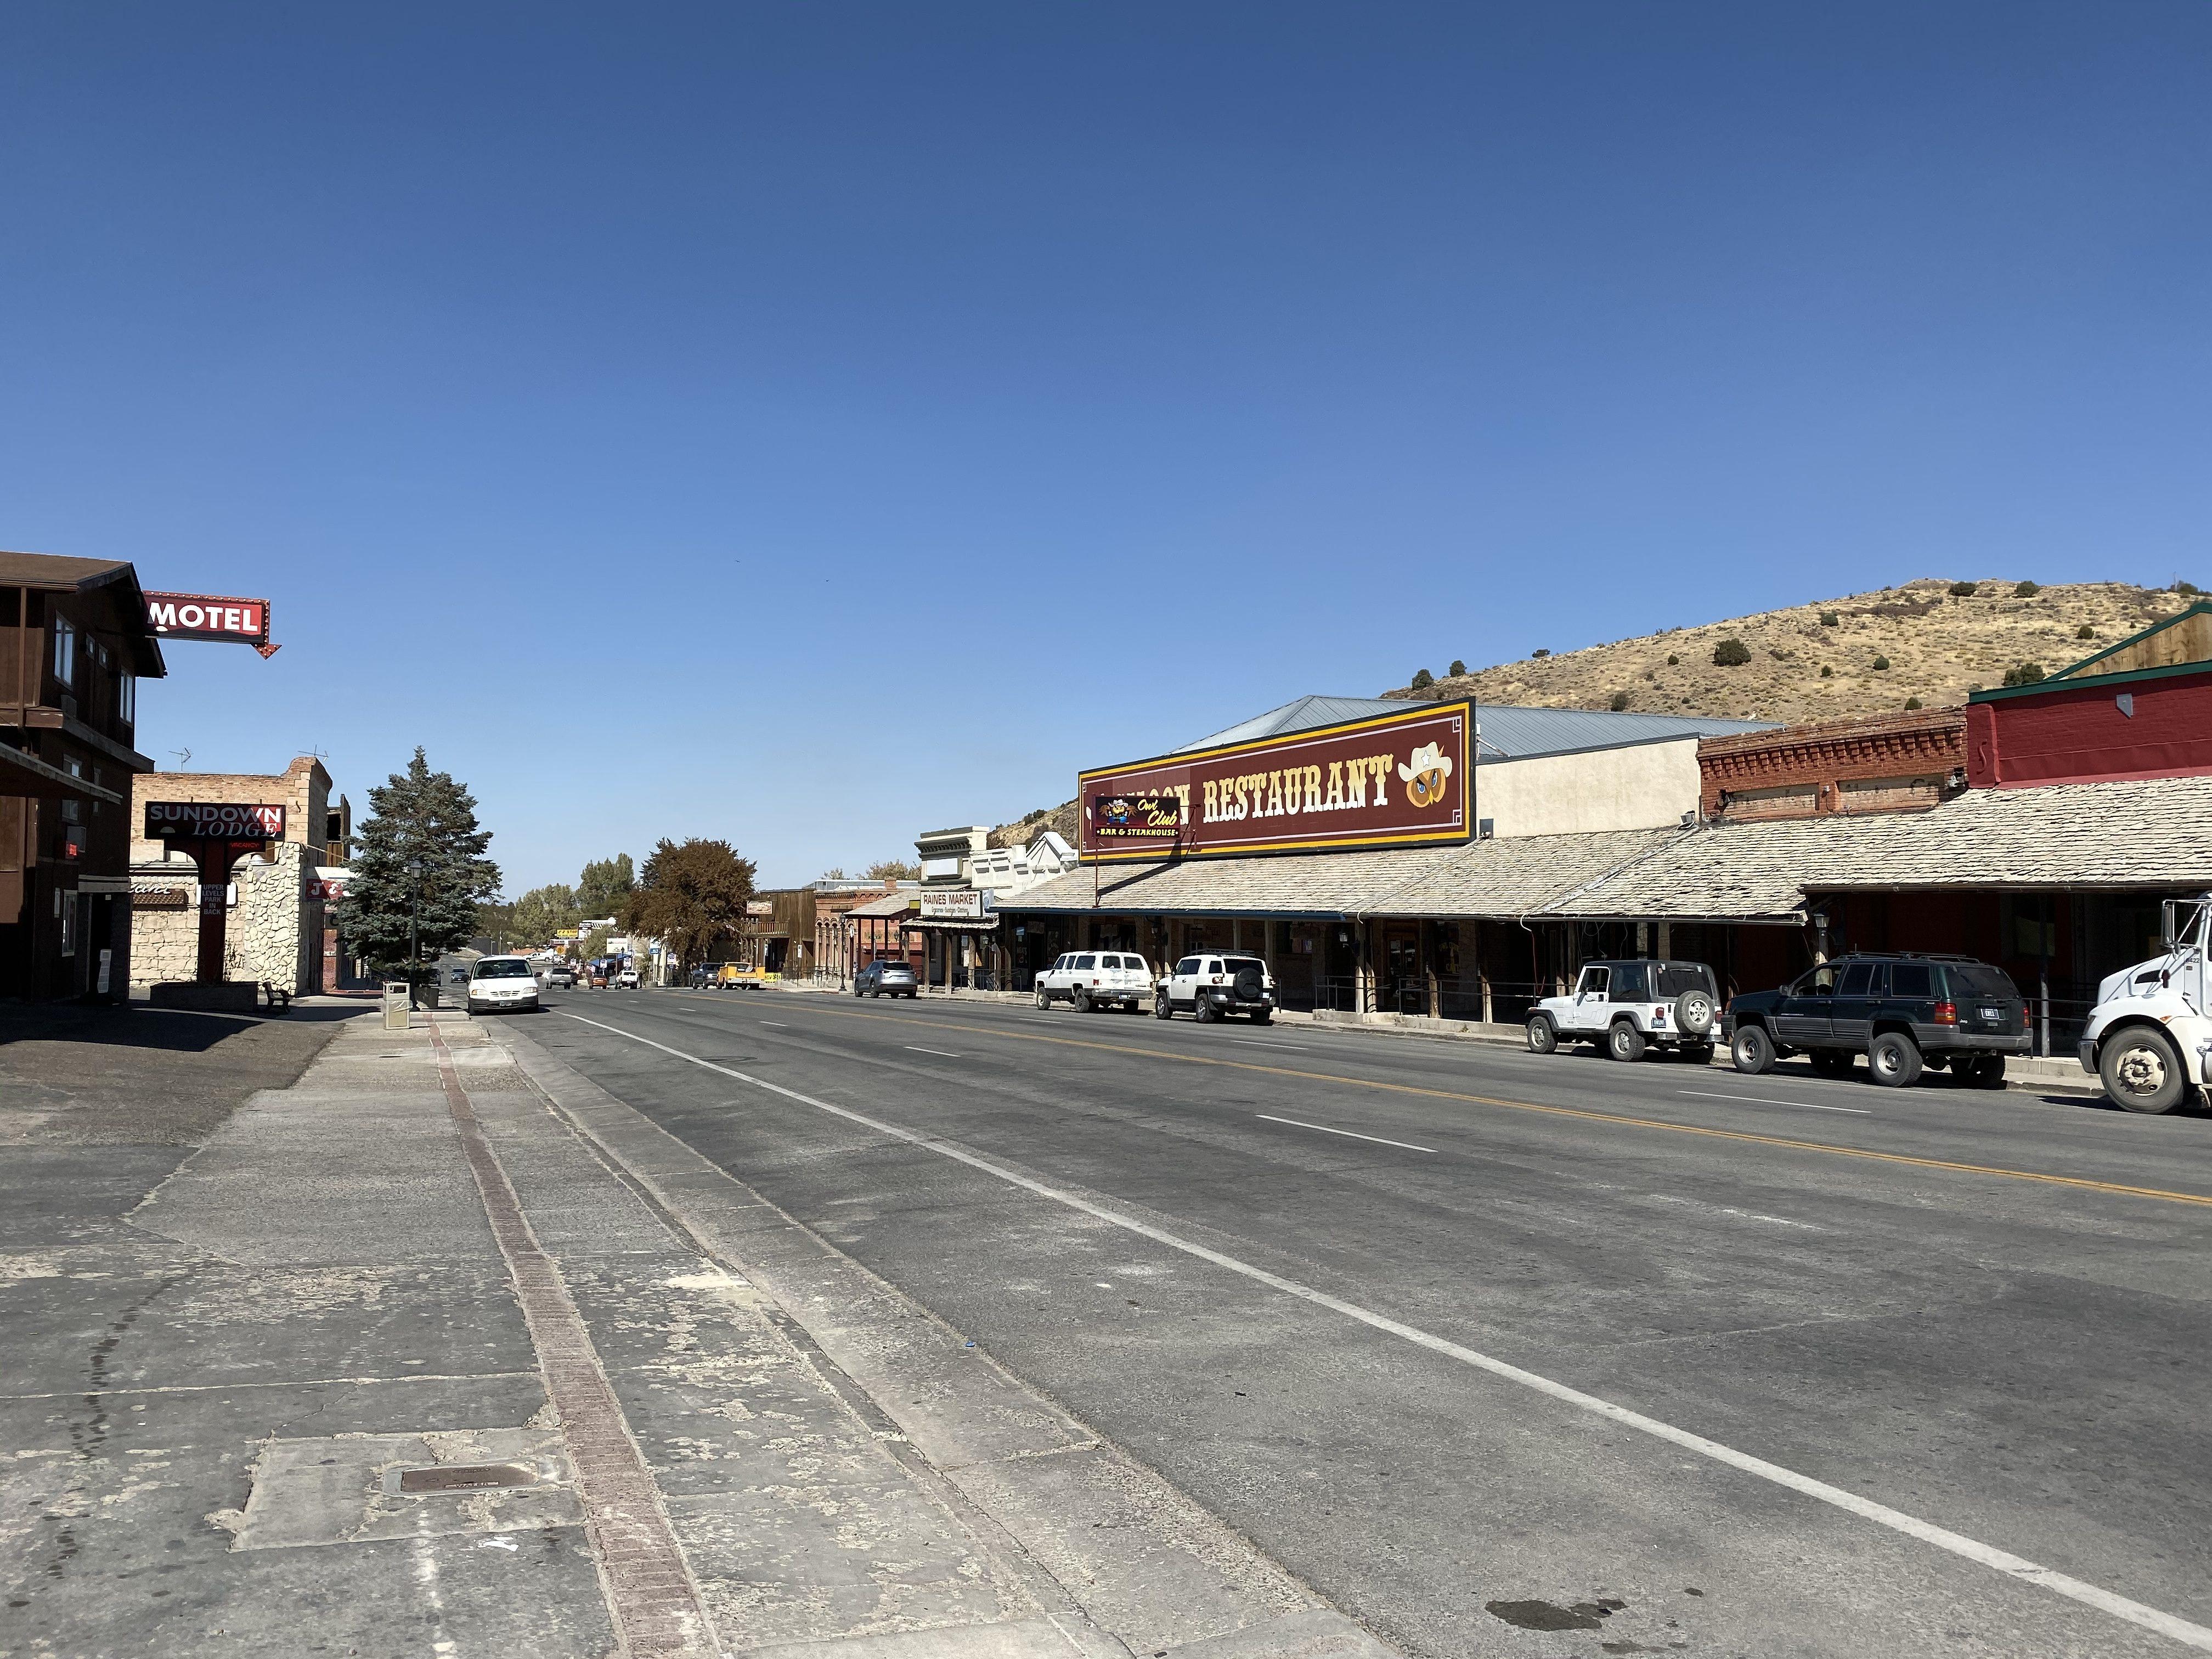 Downtown Eureka, Nevada, looking west.